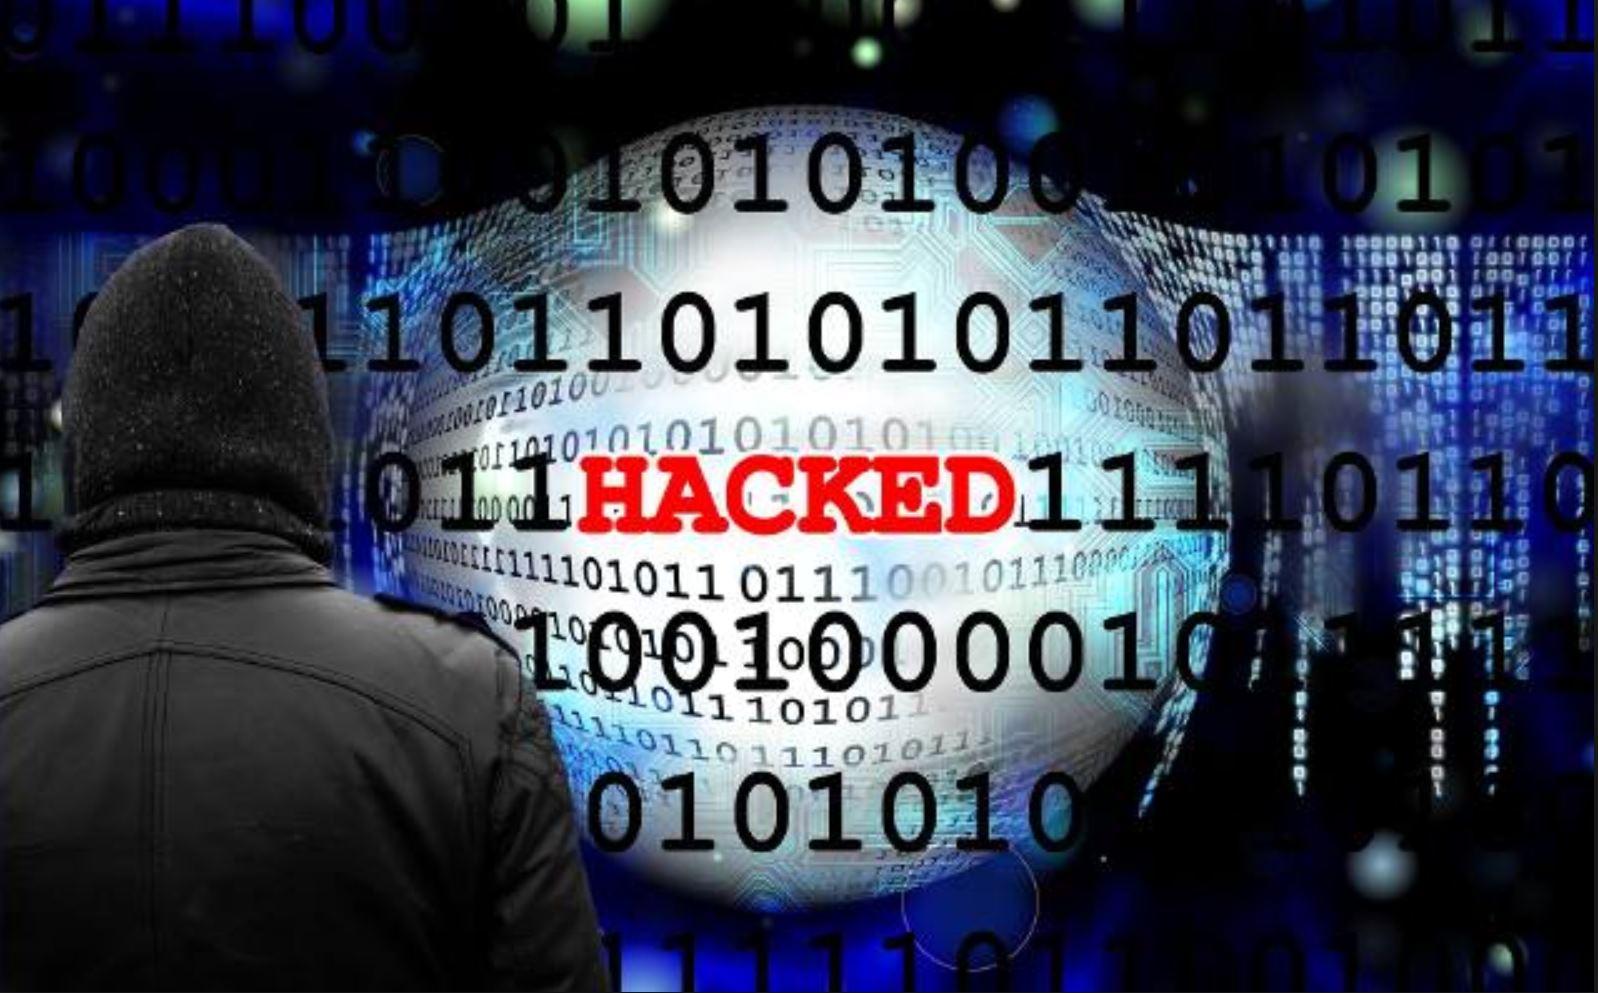 Hacker image.JPG